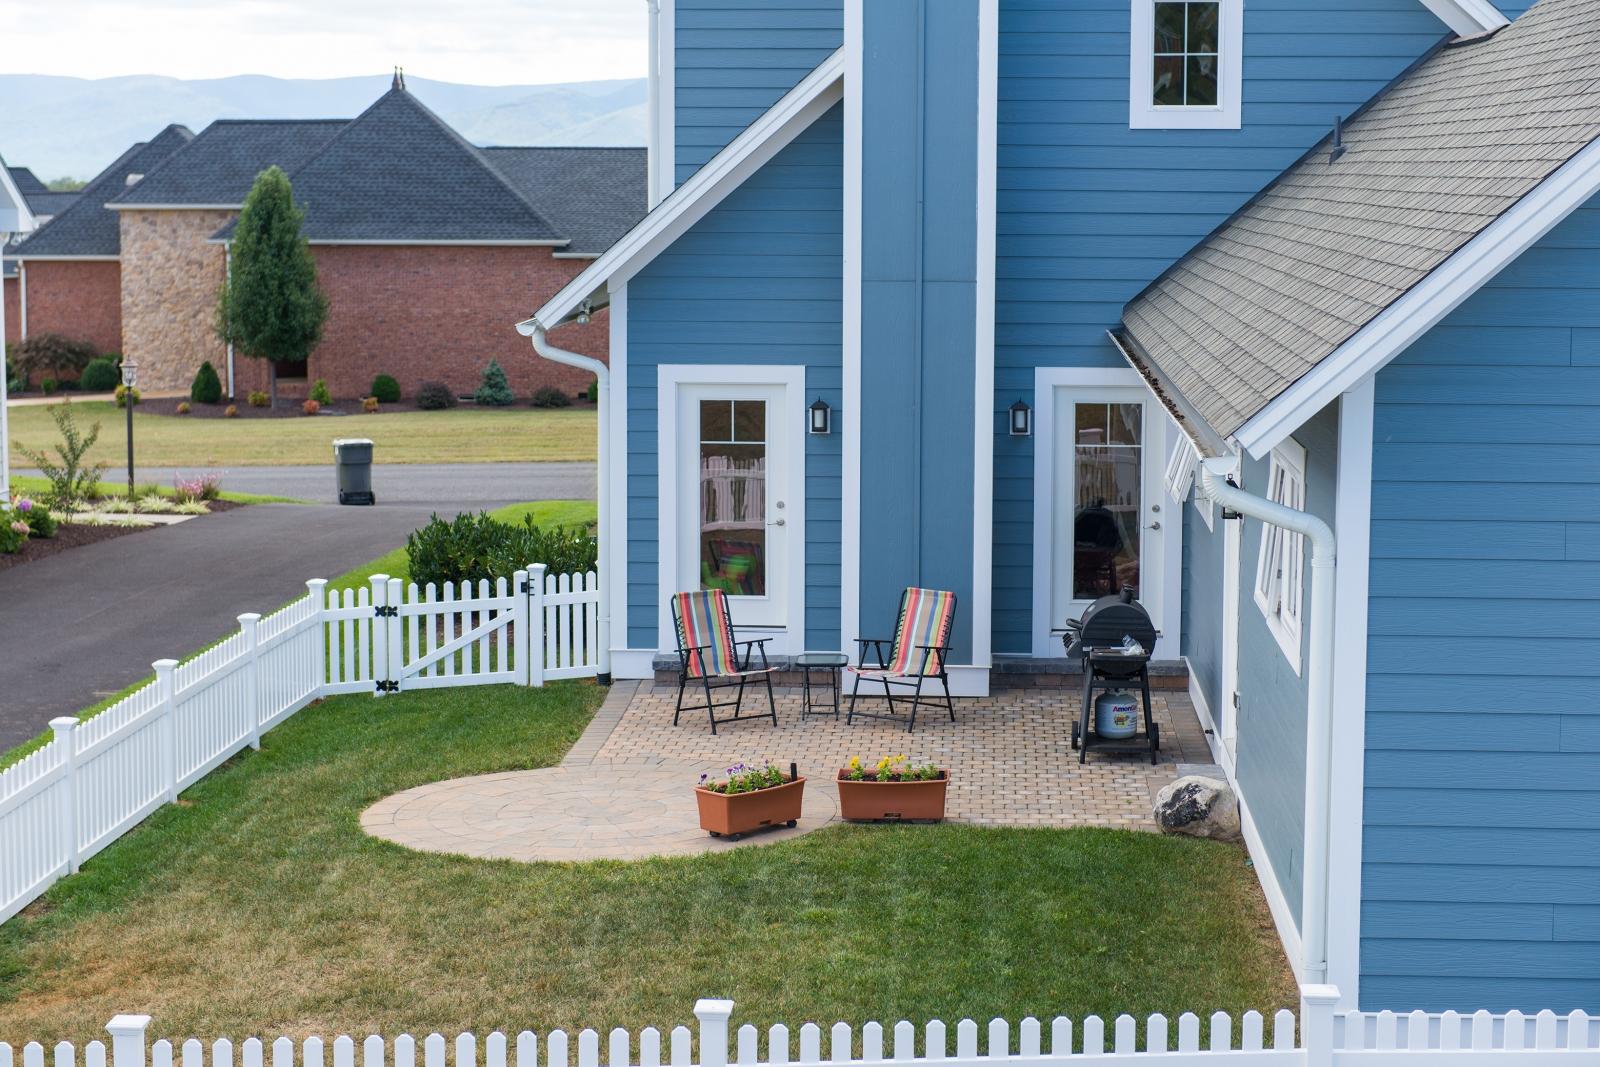 The Cottages at Crossroads Farm, Rockingham, VA